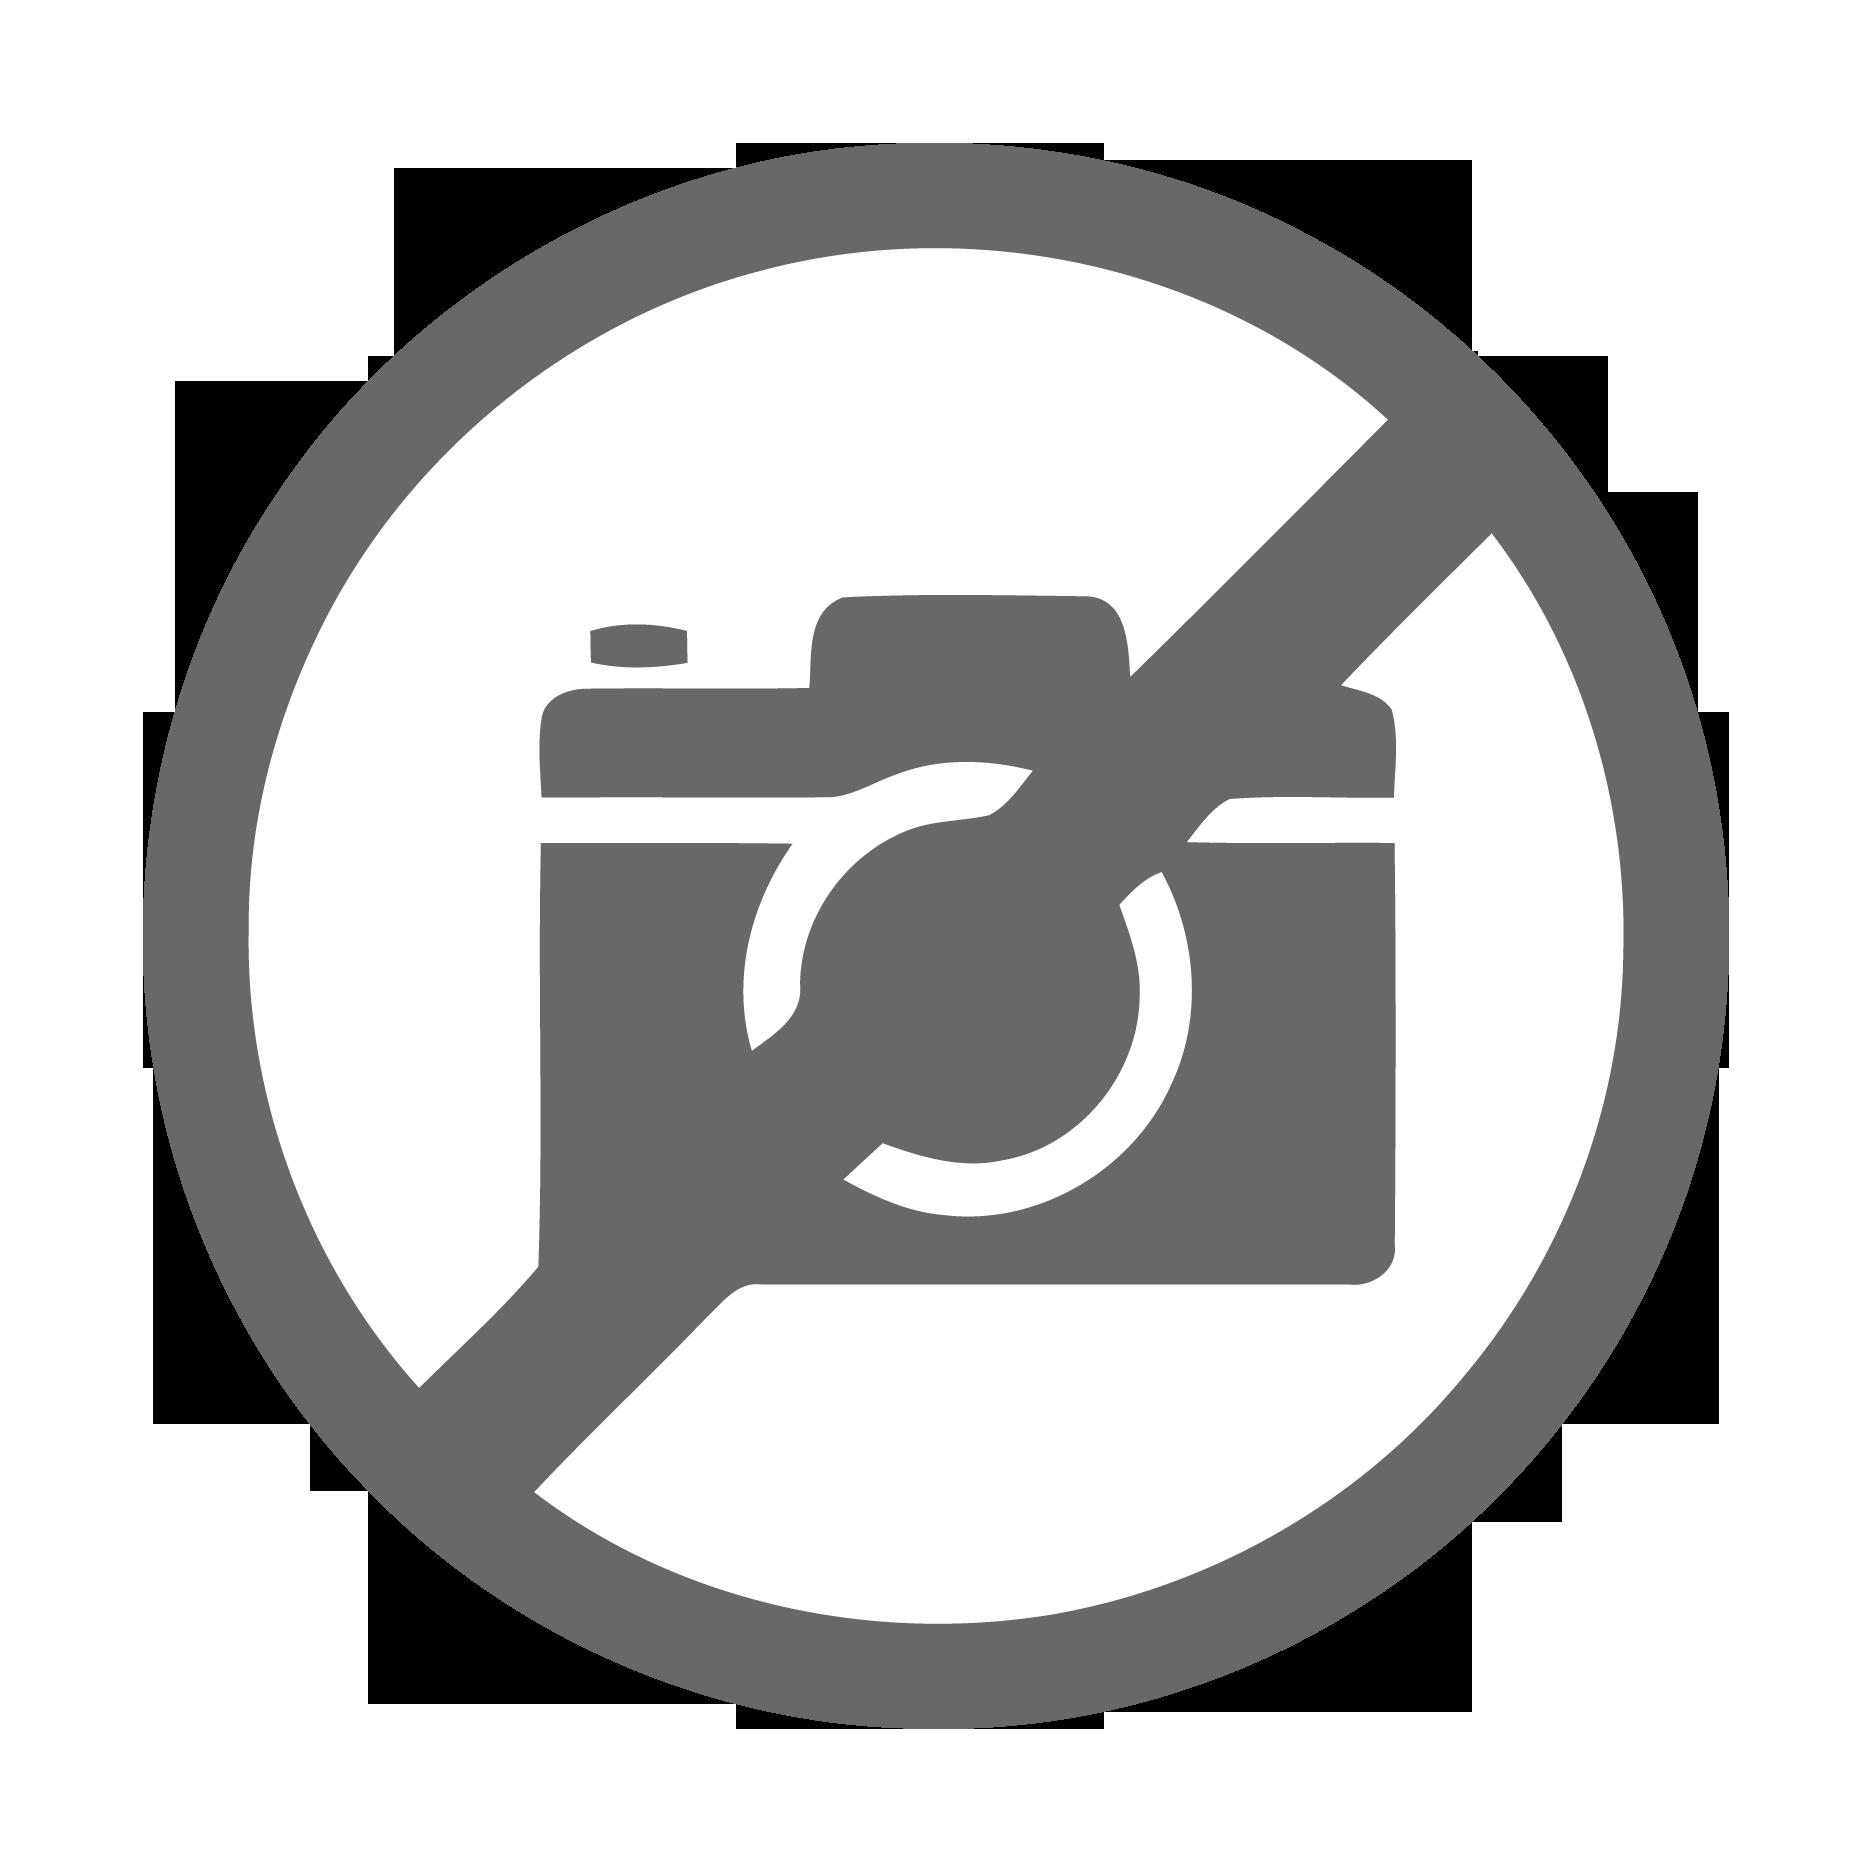 358 Foods Park Center